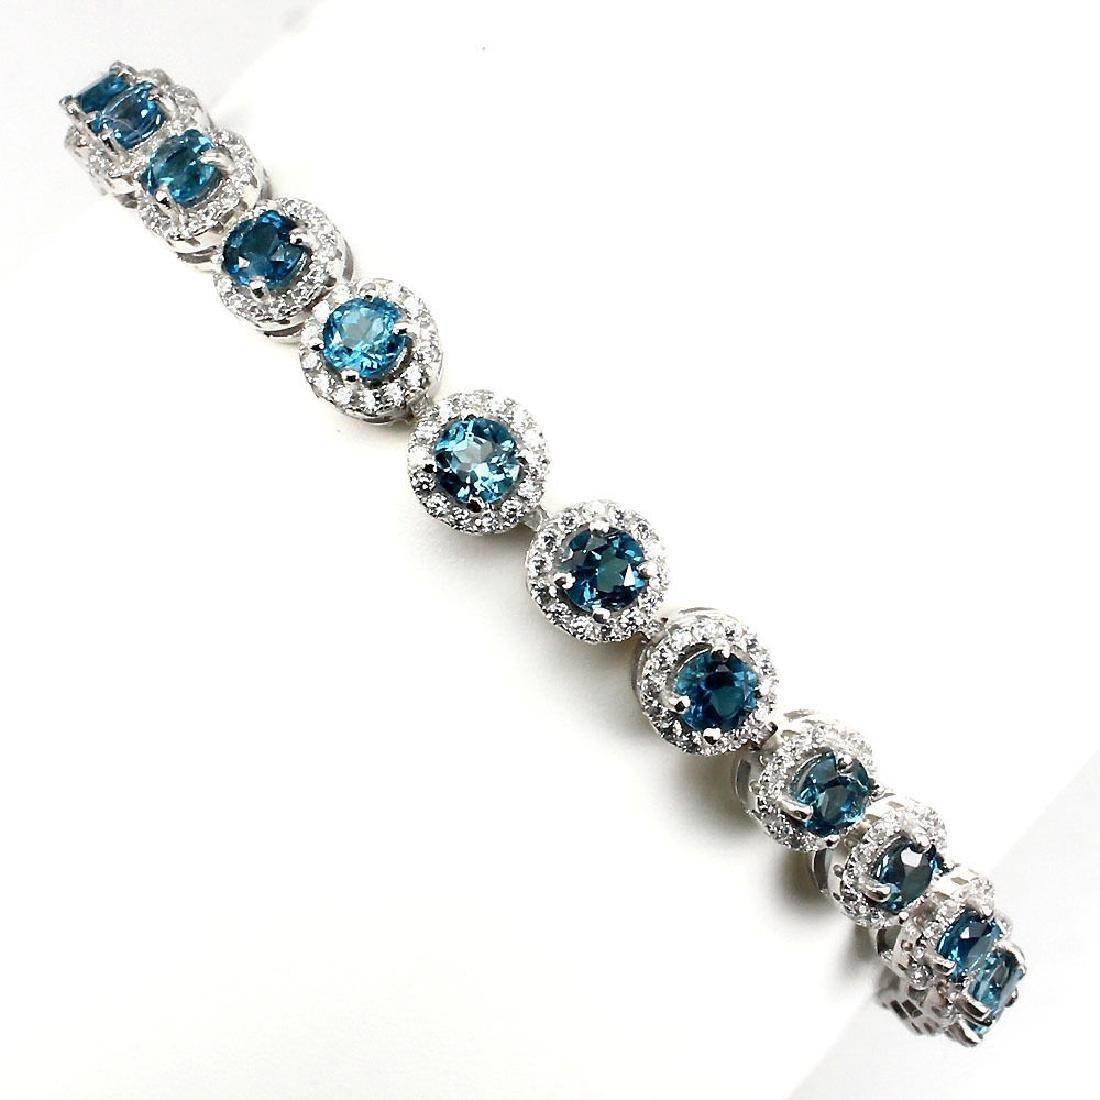 Natural London Blue Topaz 74 Carats Bracelet